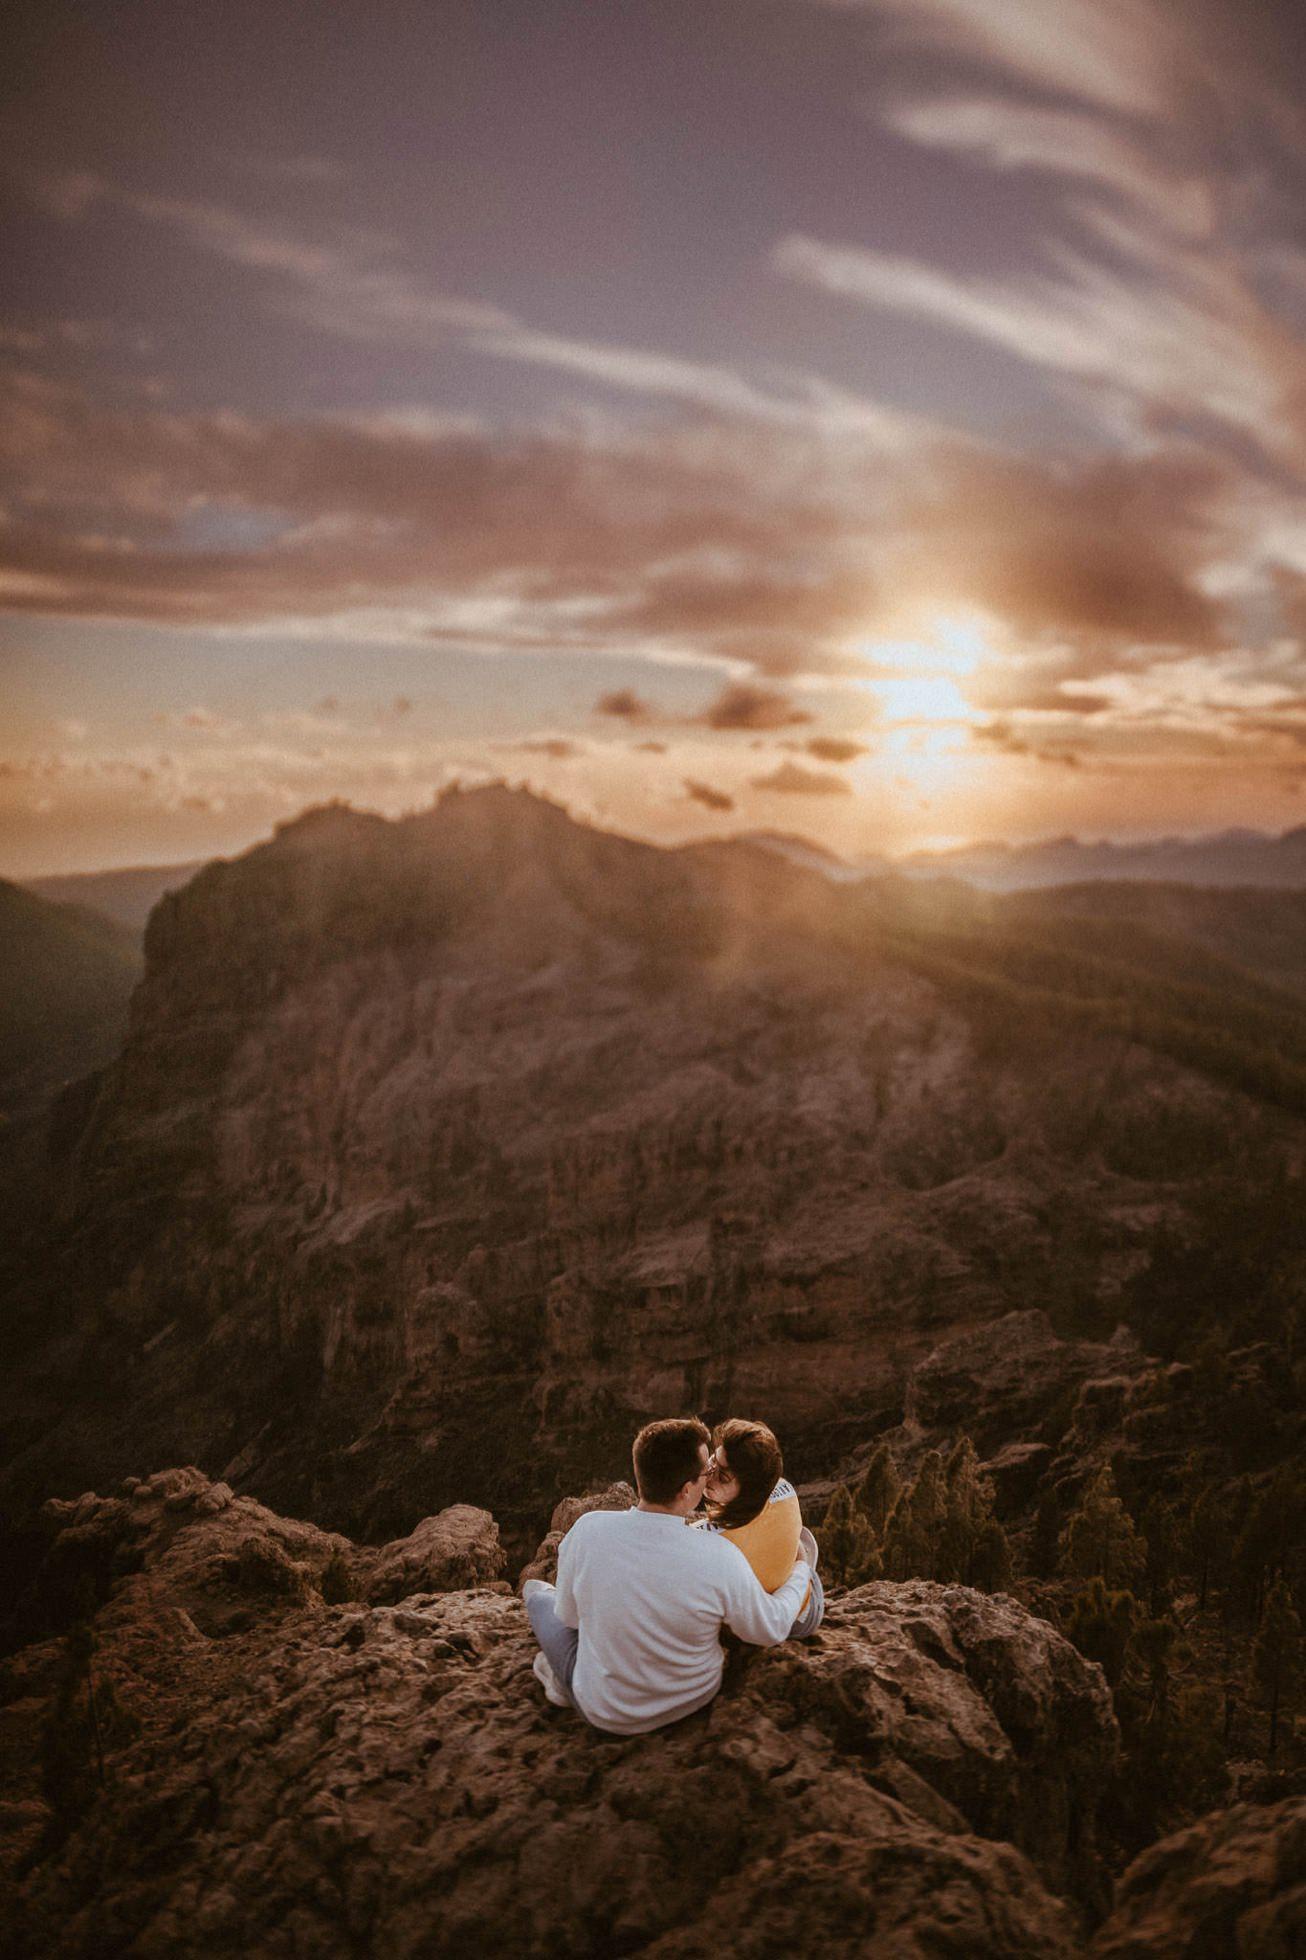 Canary islands Pico Nieves Gran Canaria Photographer 12